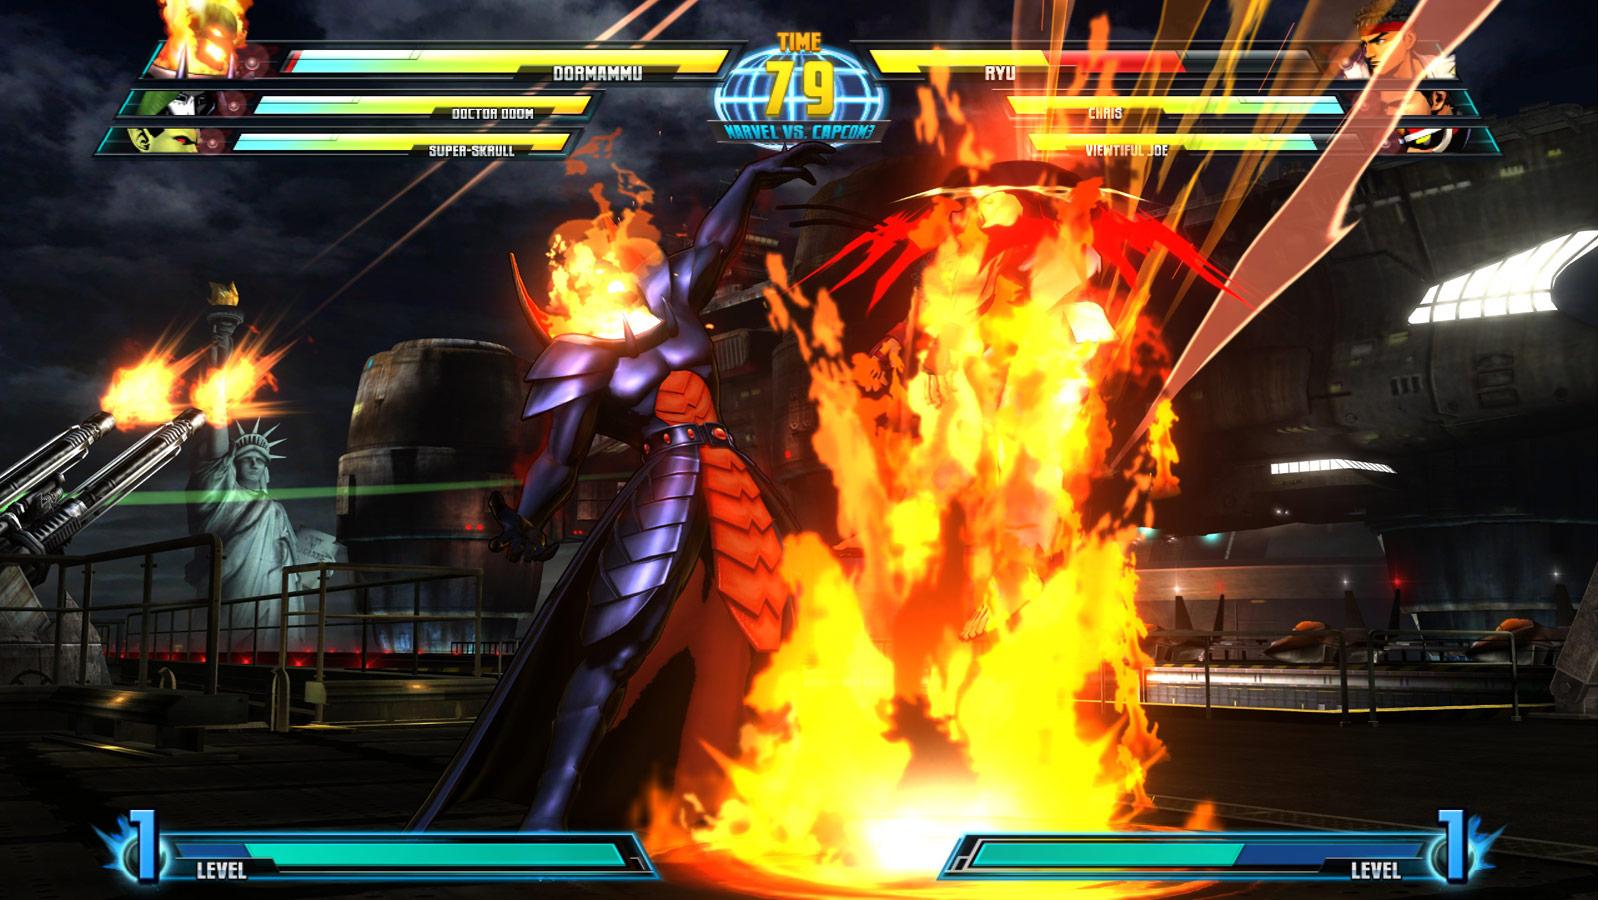 Marvel vs. Capcom 3 screen shot Aug. 18 image #12